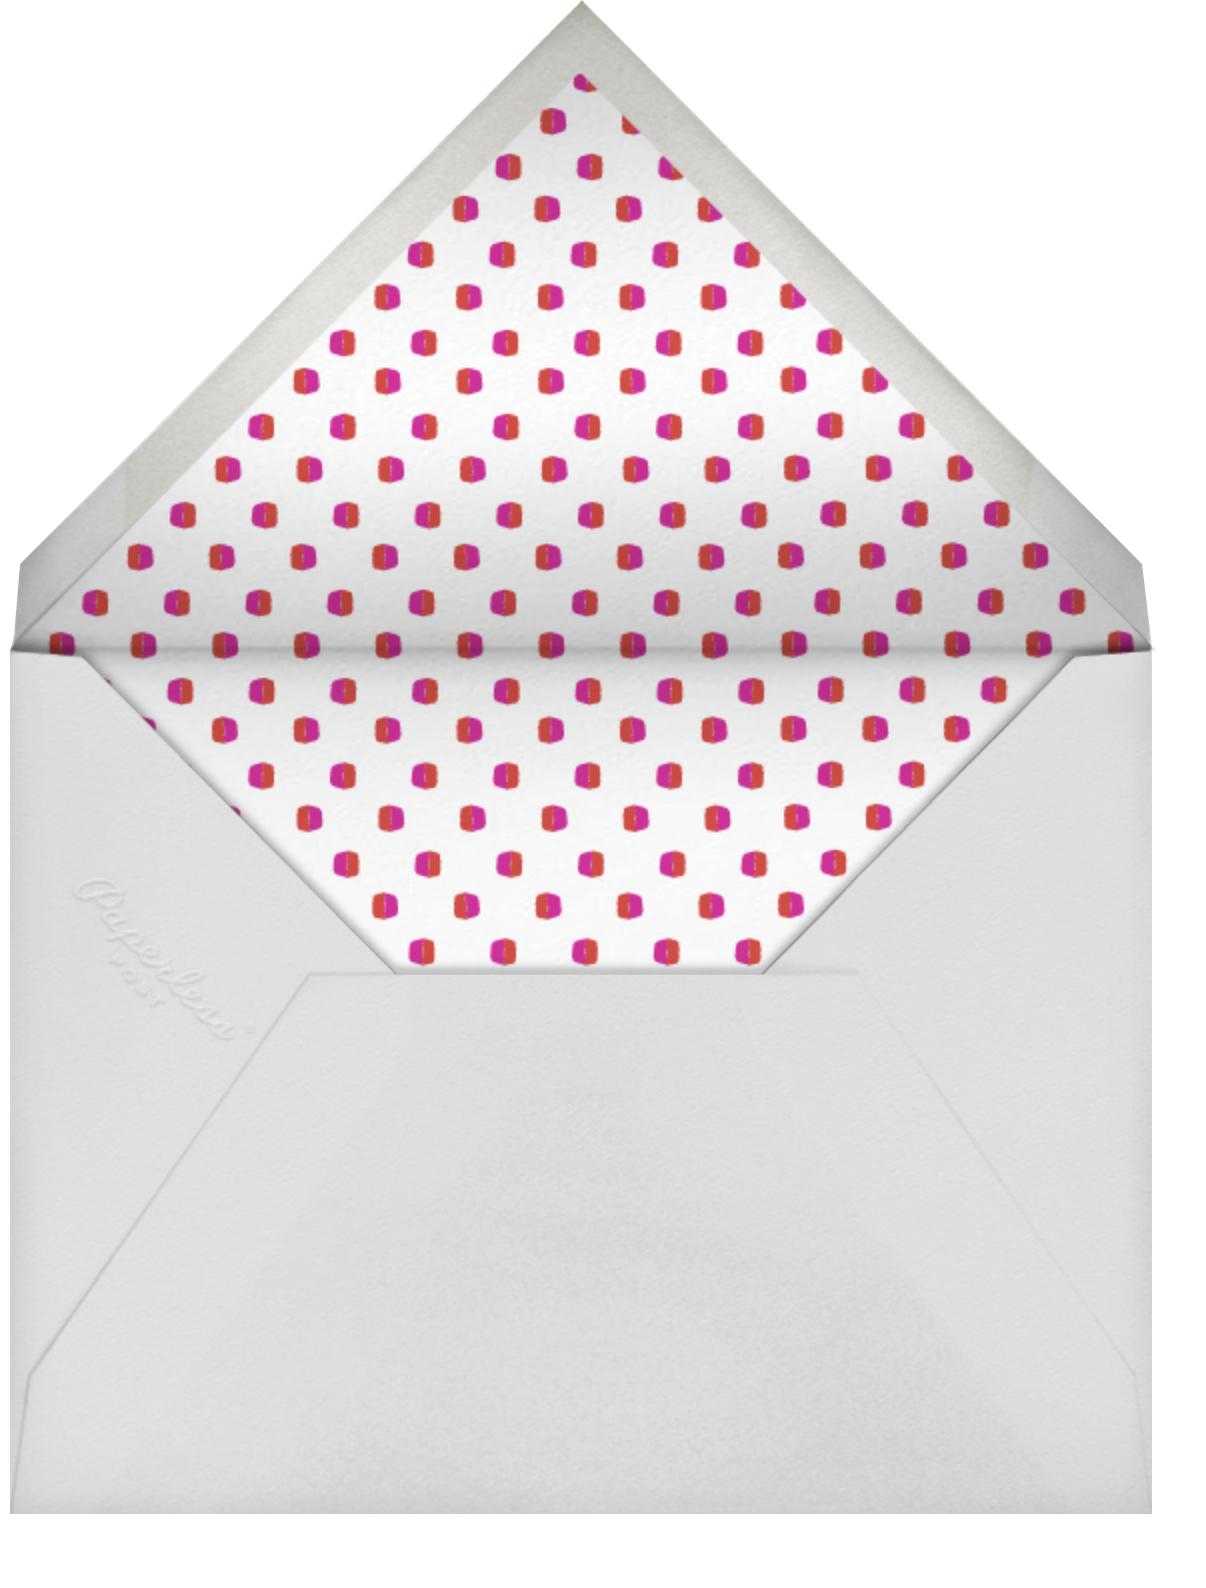 Reindeer Love - Multi - Mr. Boddington's Studio - Envelope